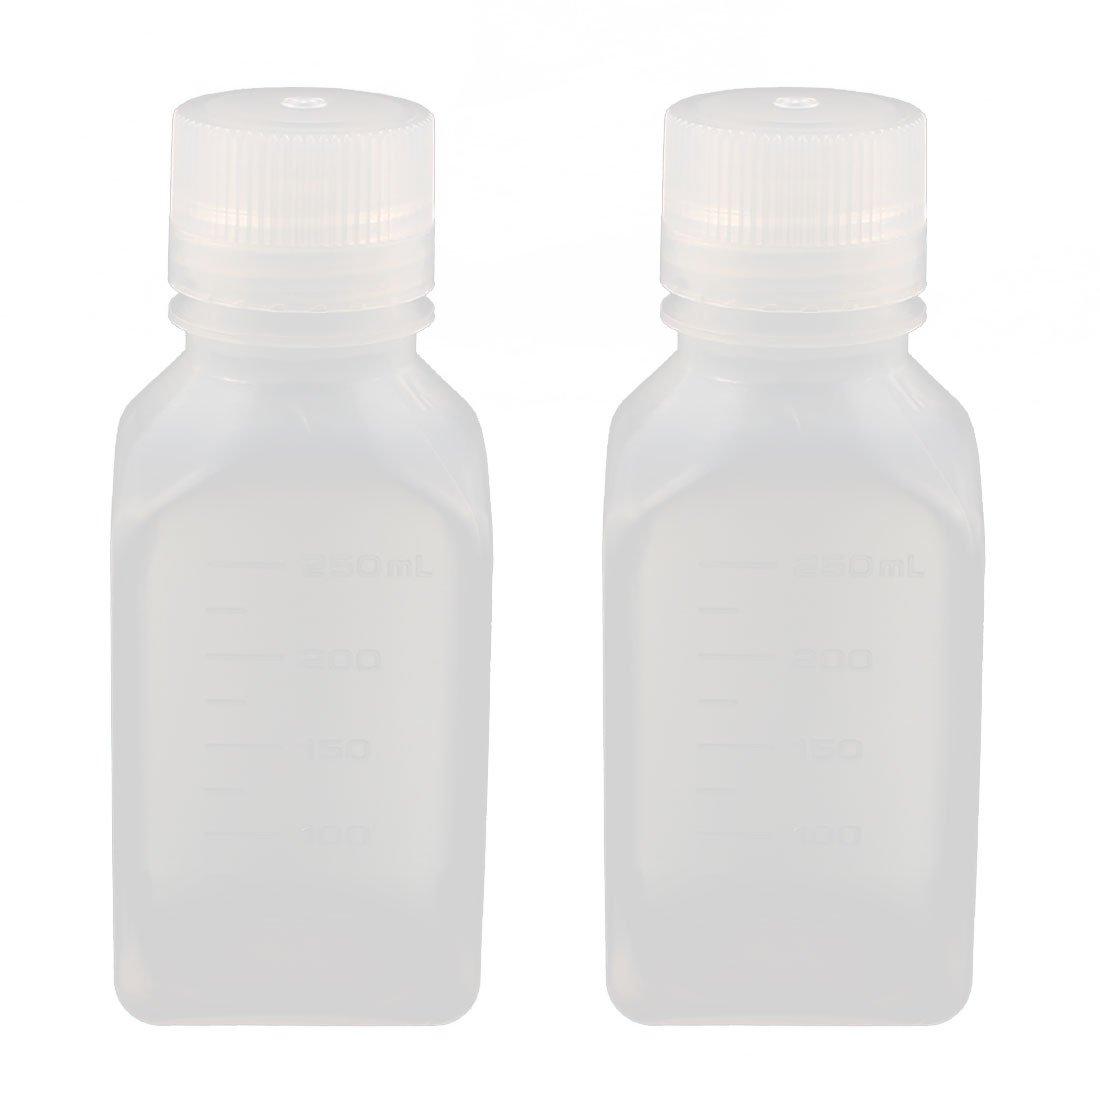 sourcingmap® 2Pcs 250ml PP Square Wide Mouth Seal Reagent Bottle Chemical Sample Bottle US-SA-AJD-174536